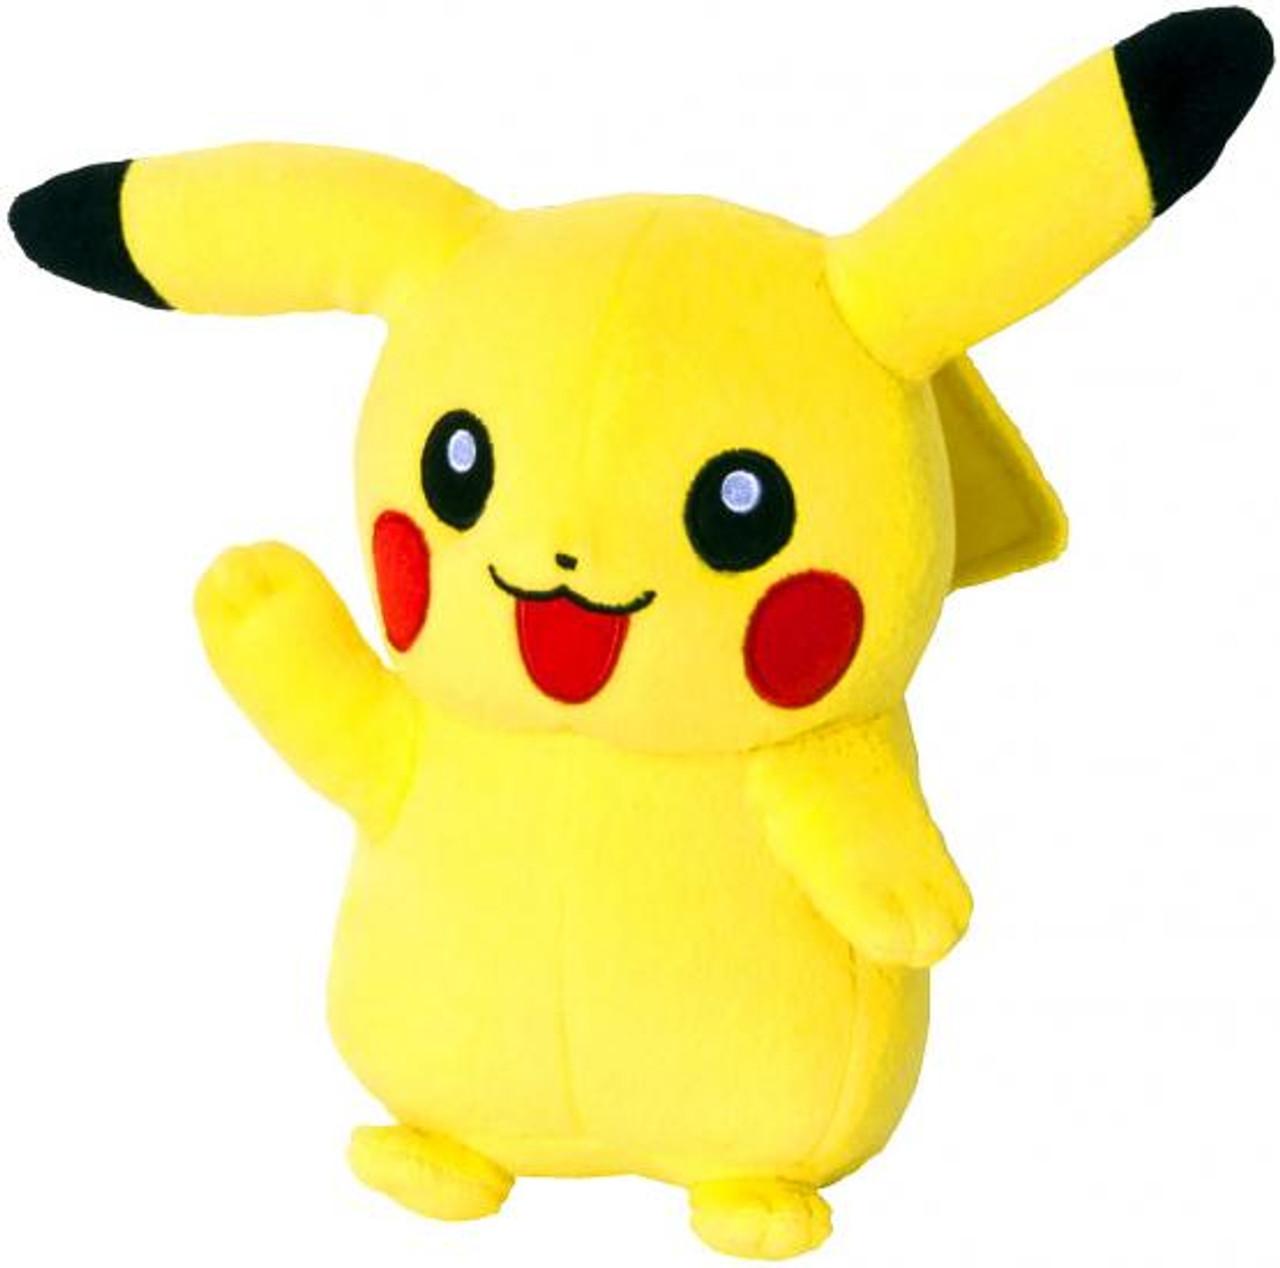 Pokemon TOMY Pikachu 8-Inch Trainer's Choice Plush